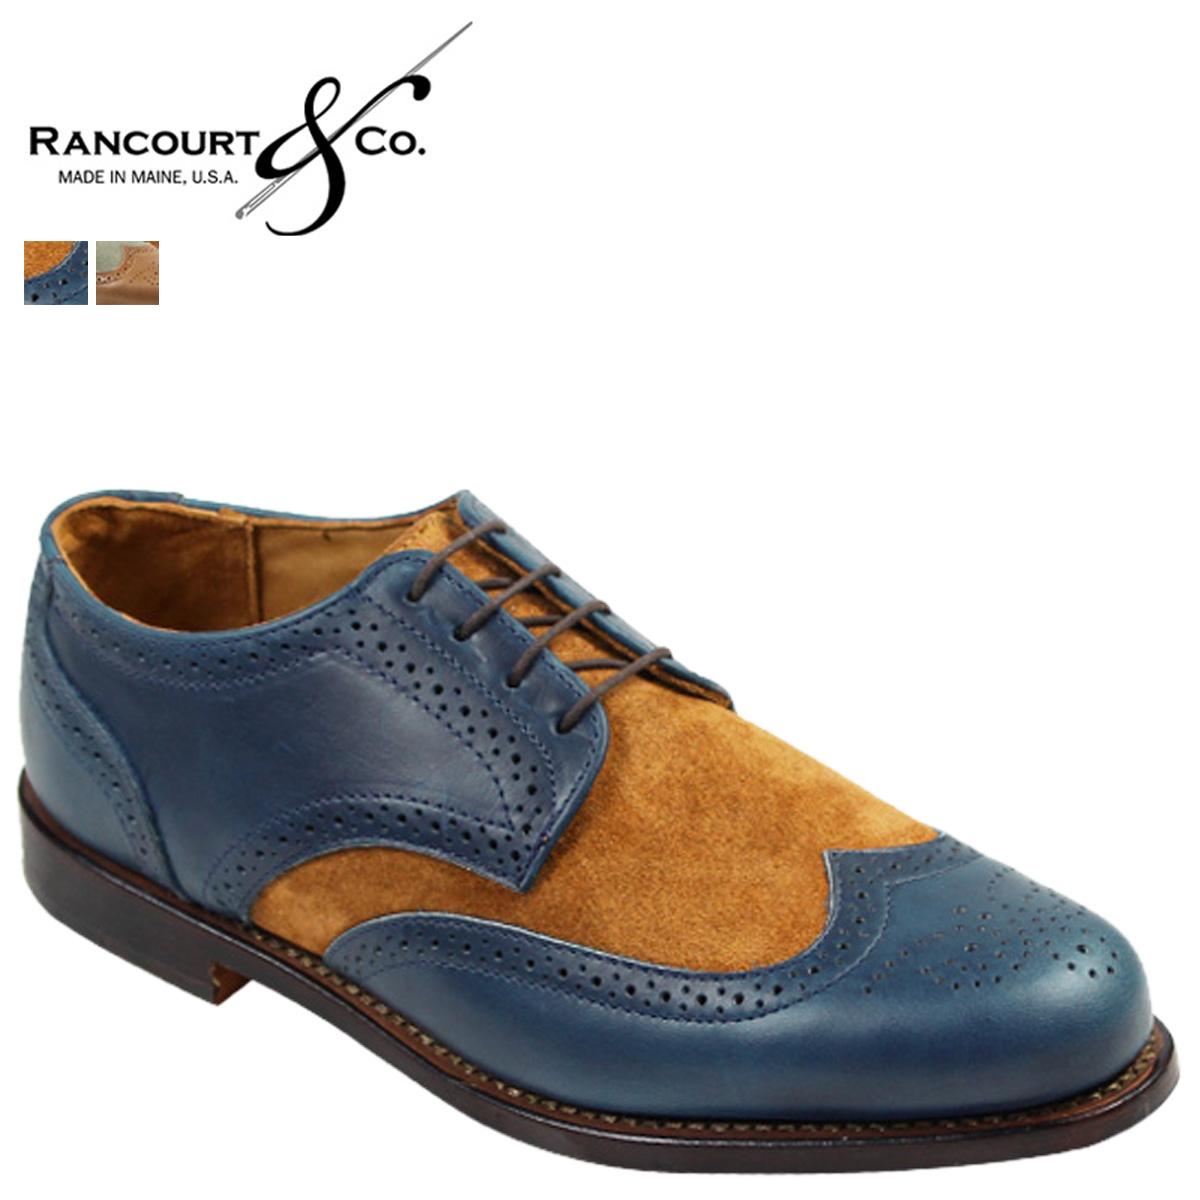 8cd8b5deb2 ALLSPORTS  Point 10 times rancourtandcoa Rancourt  amp  Co. Blake ...